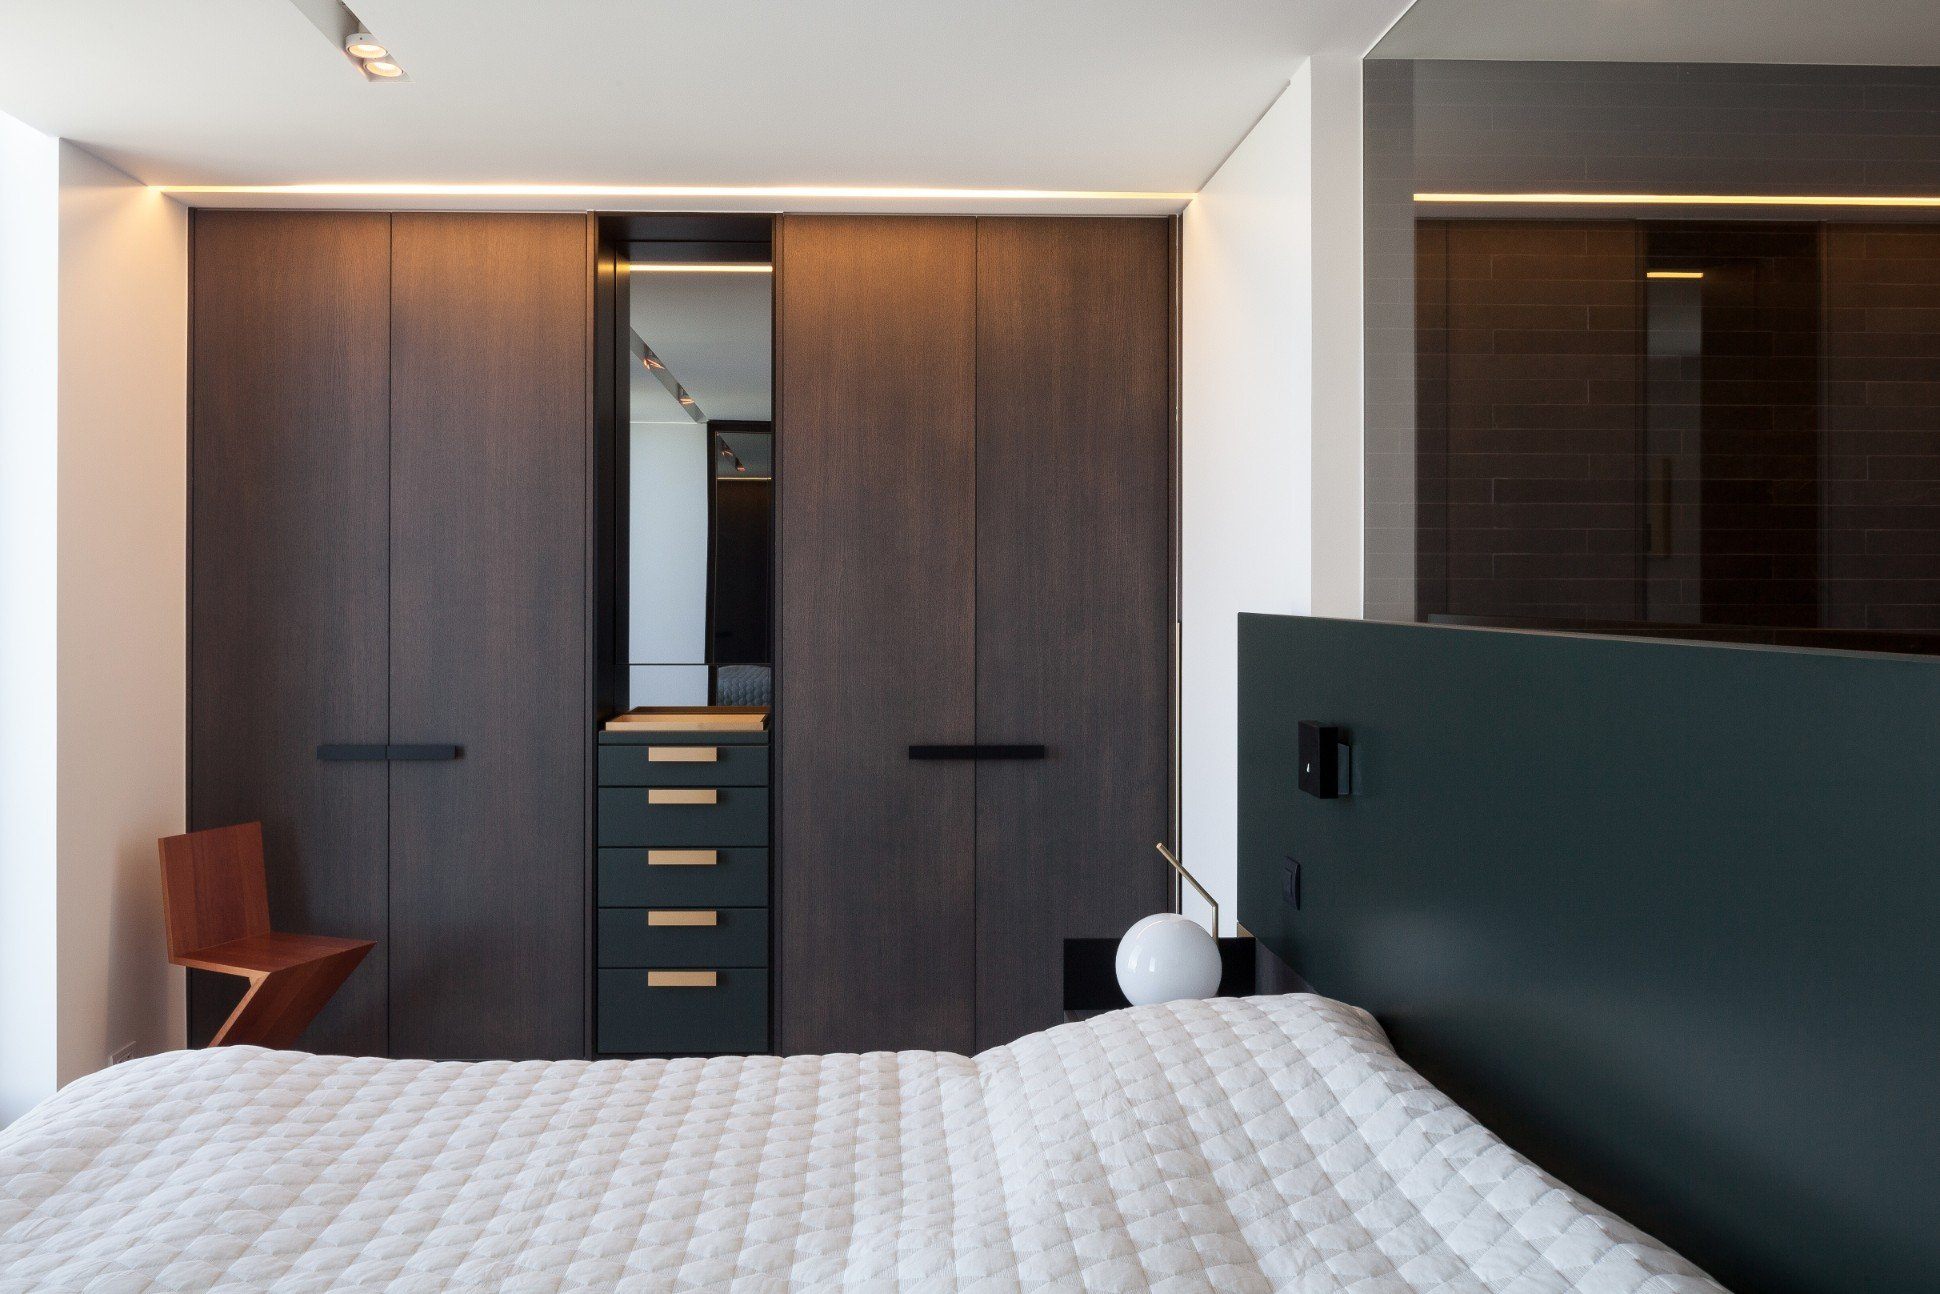 Rietveldprojects-penthouse-appartement-design-architectuur-kust9